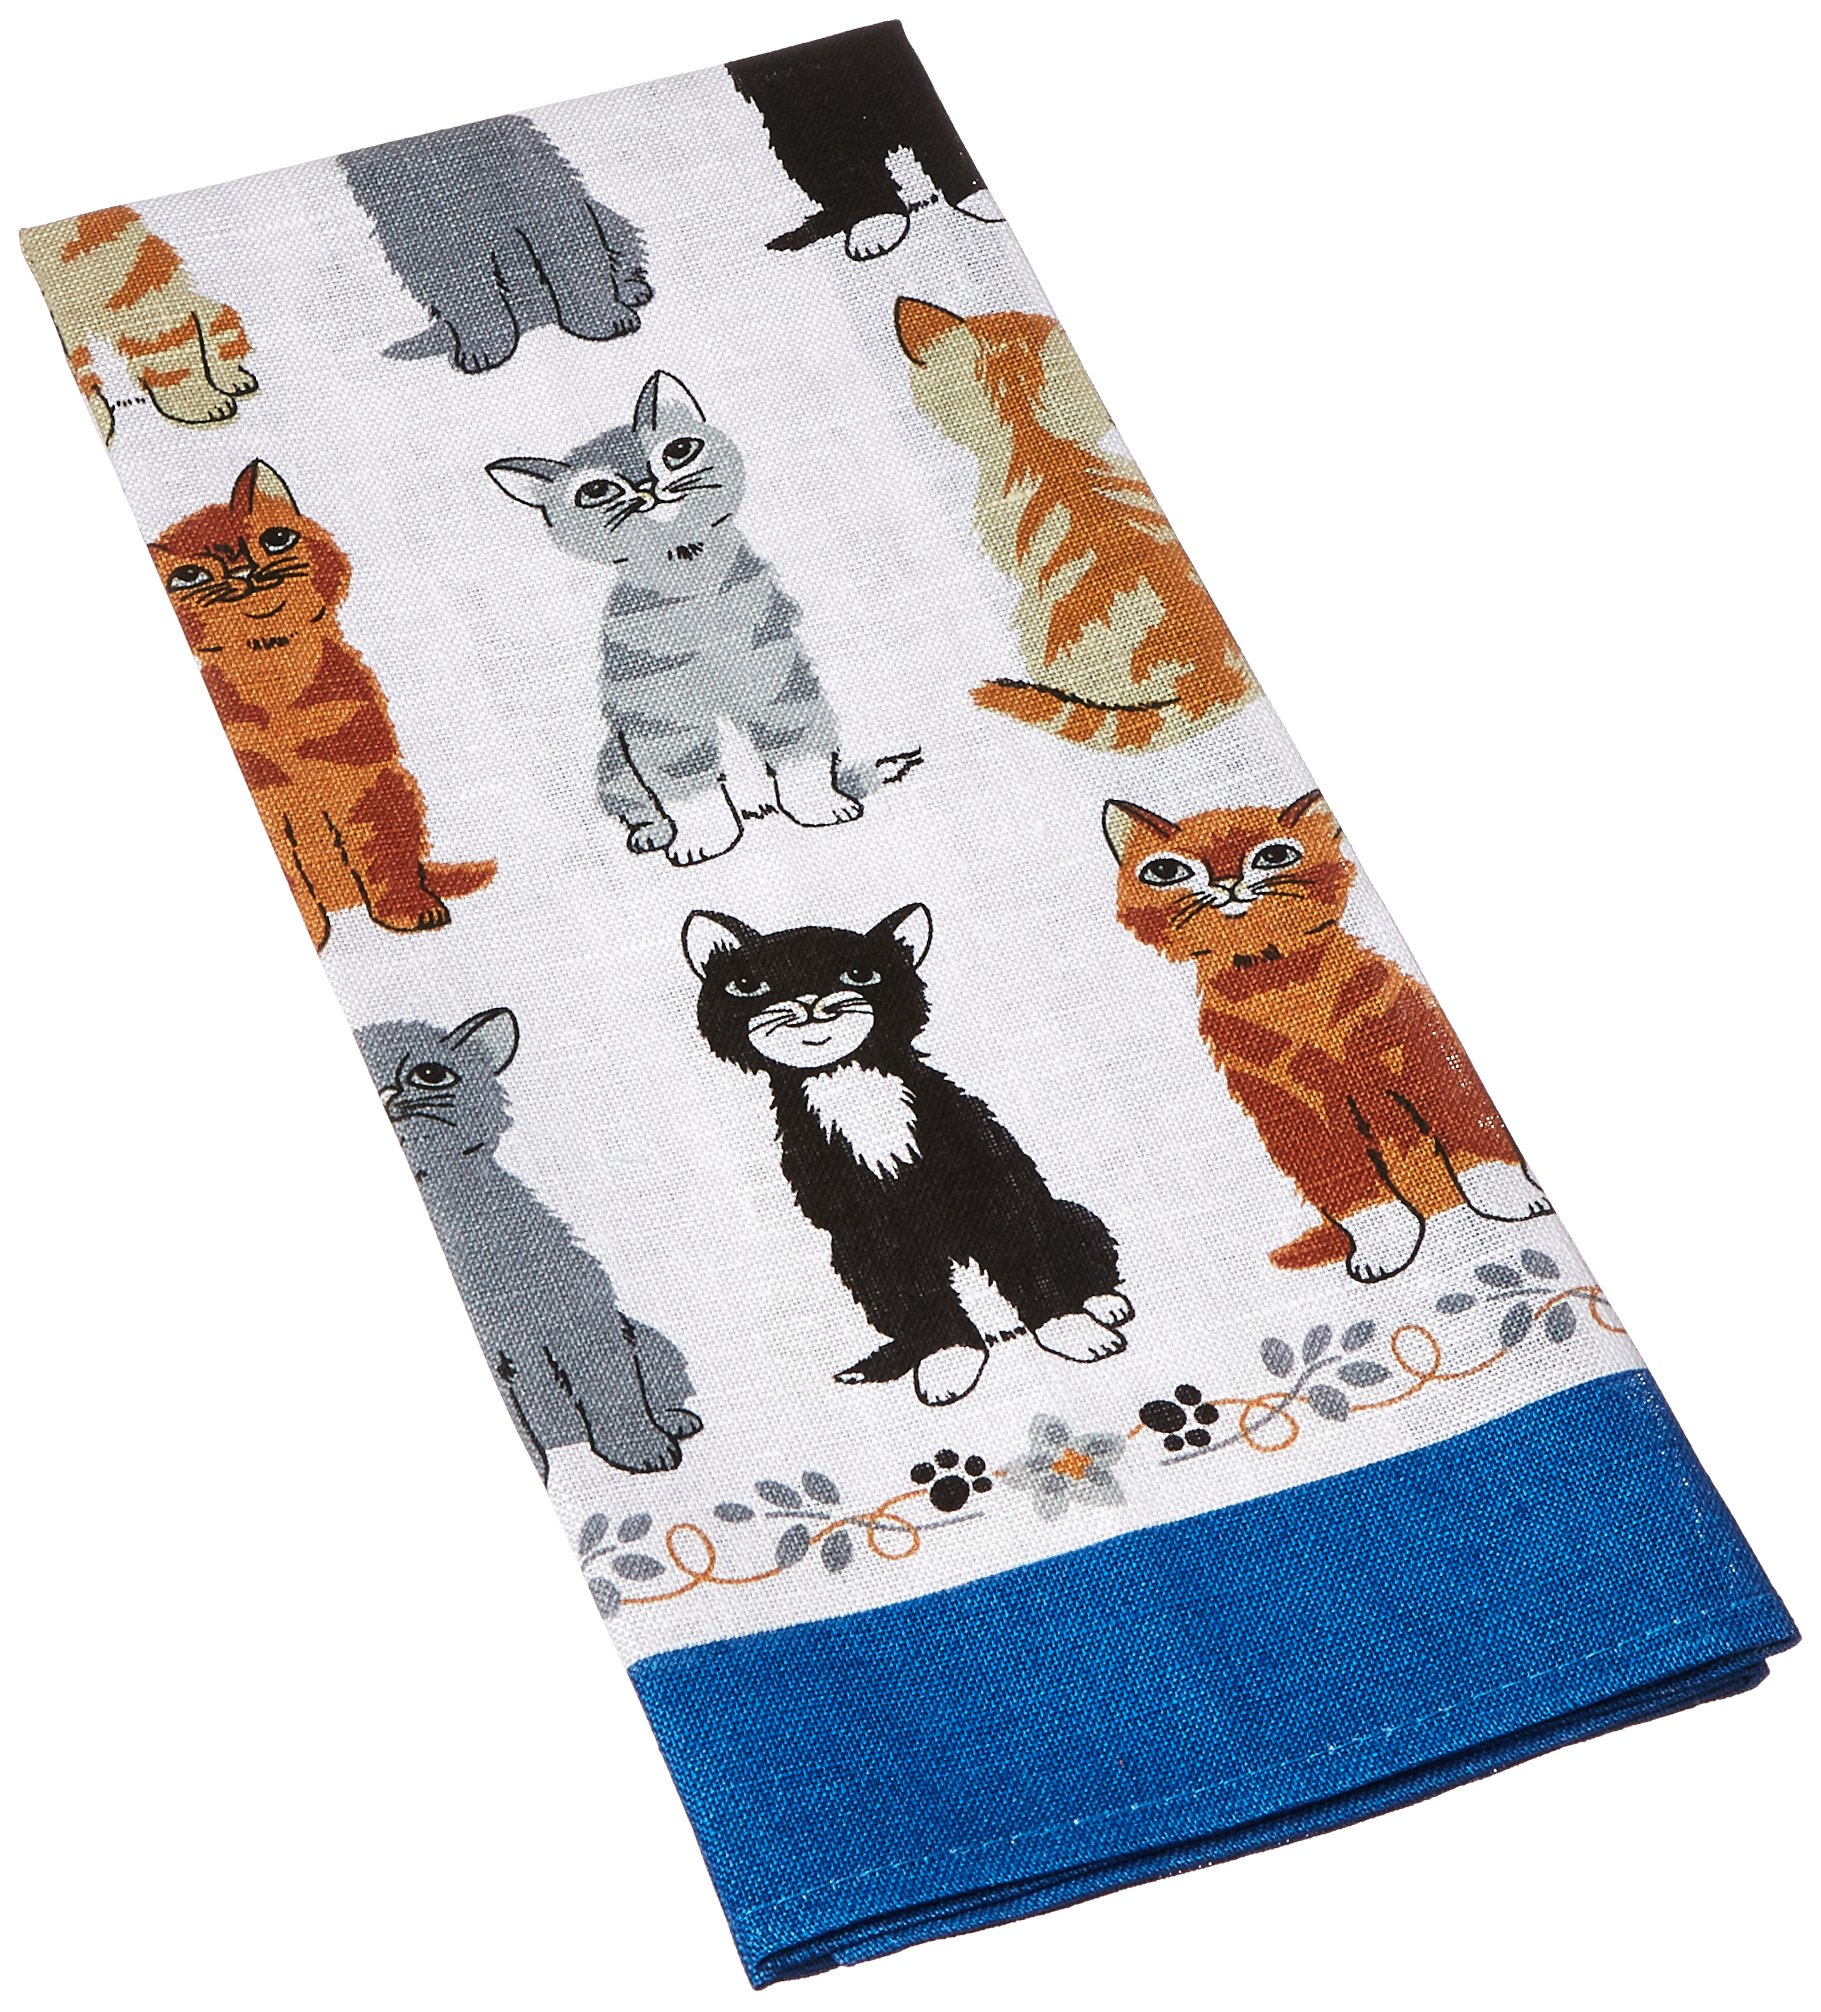 Ulster Weavers Kittens Arrived Linen Tea Towel